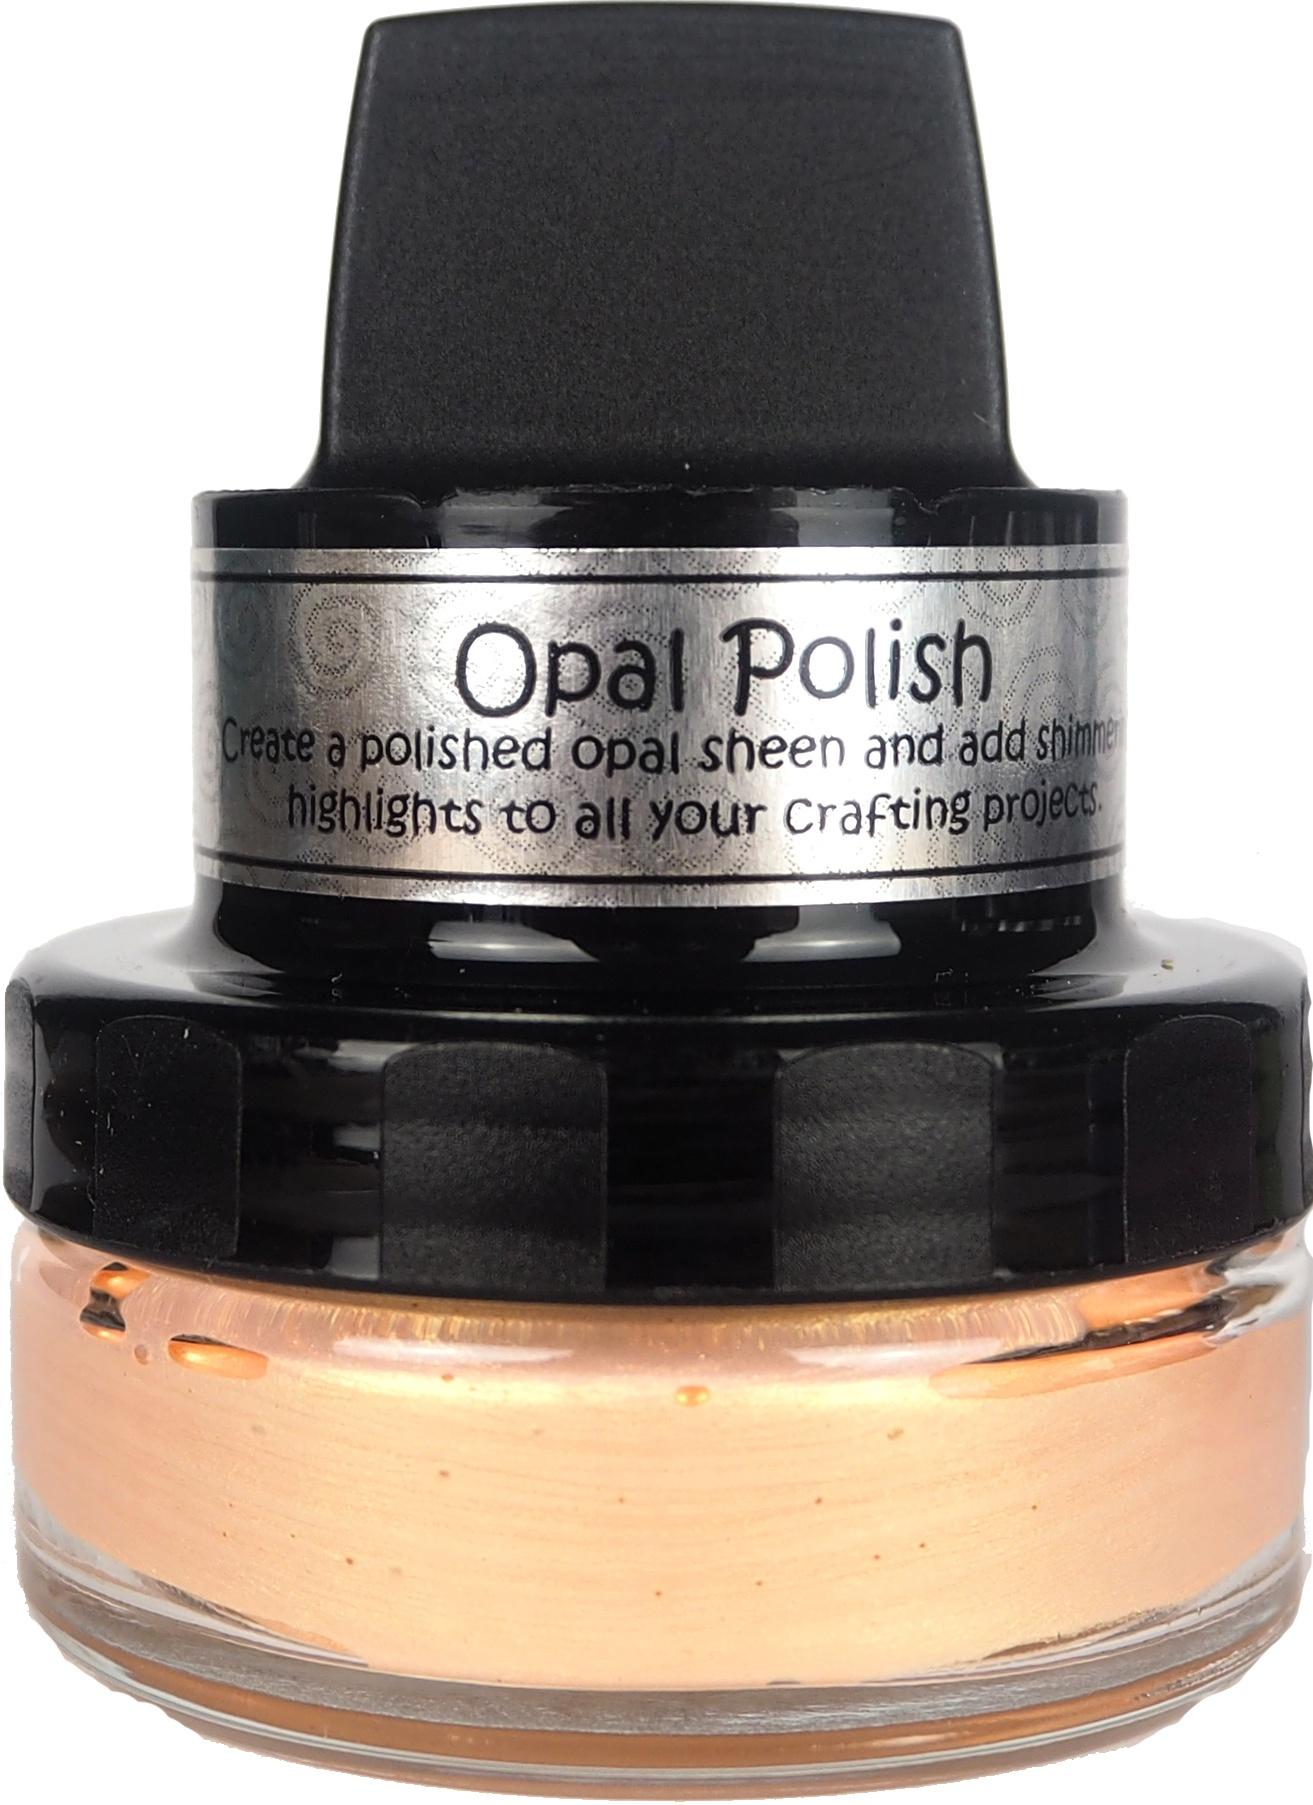 Cosmic Shimmer Opal Polish Gilded Apricot